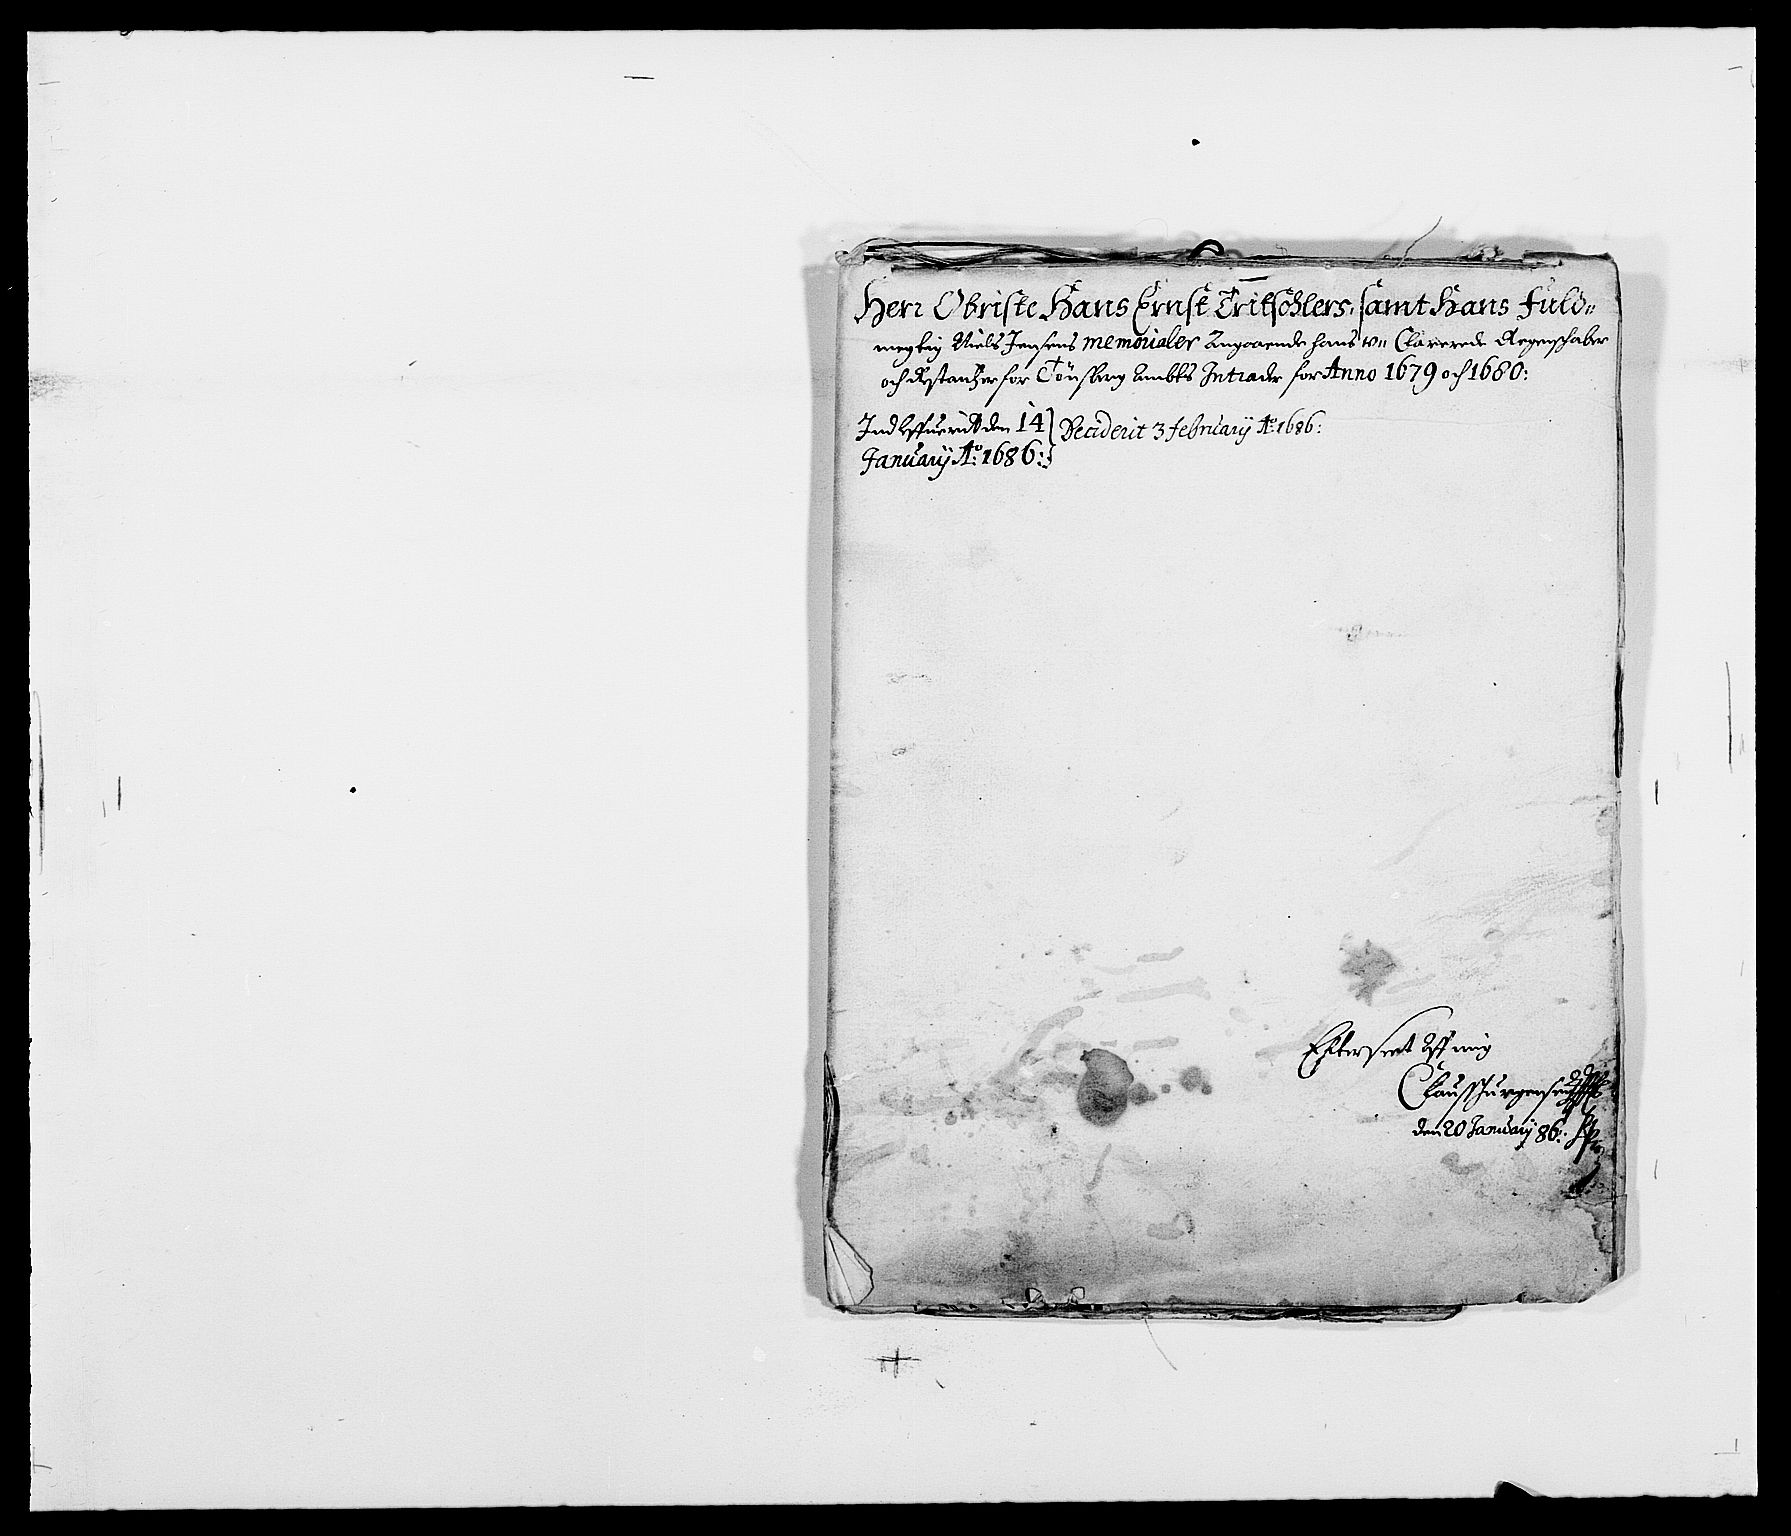 RA, Rentekammeret inntil 1814, Reviderte regnskaper, Fogderegnskap, R32/L1849: Fogderegnskap Jarlsberg grevskap, 1679-1680, s. 73